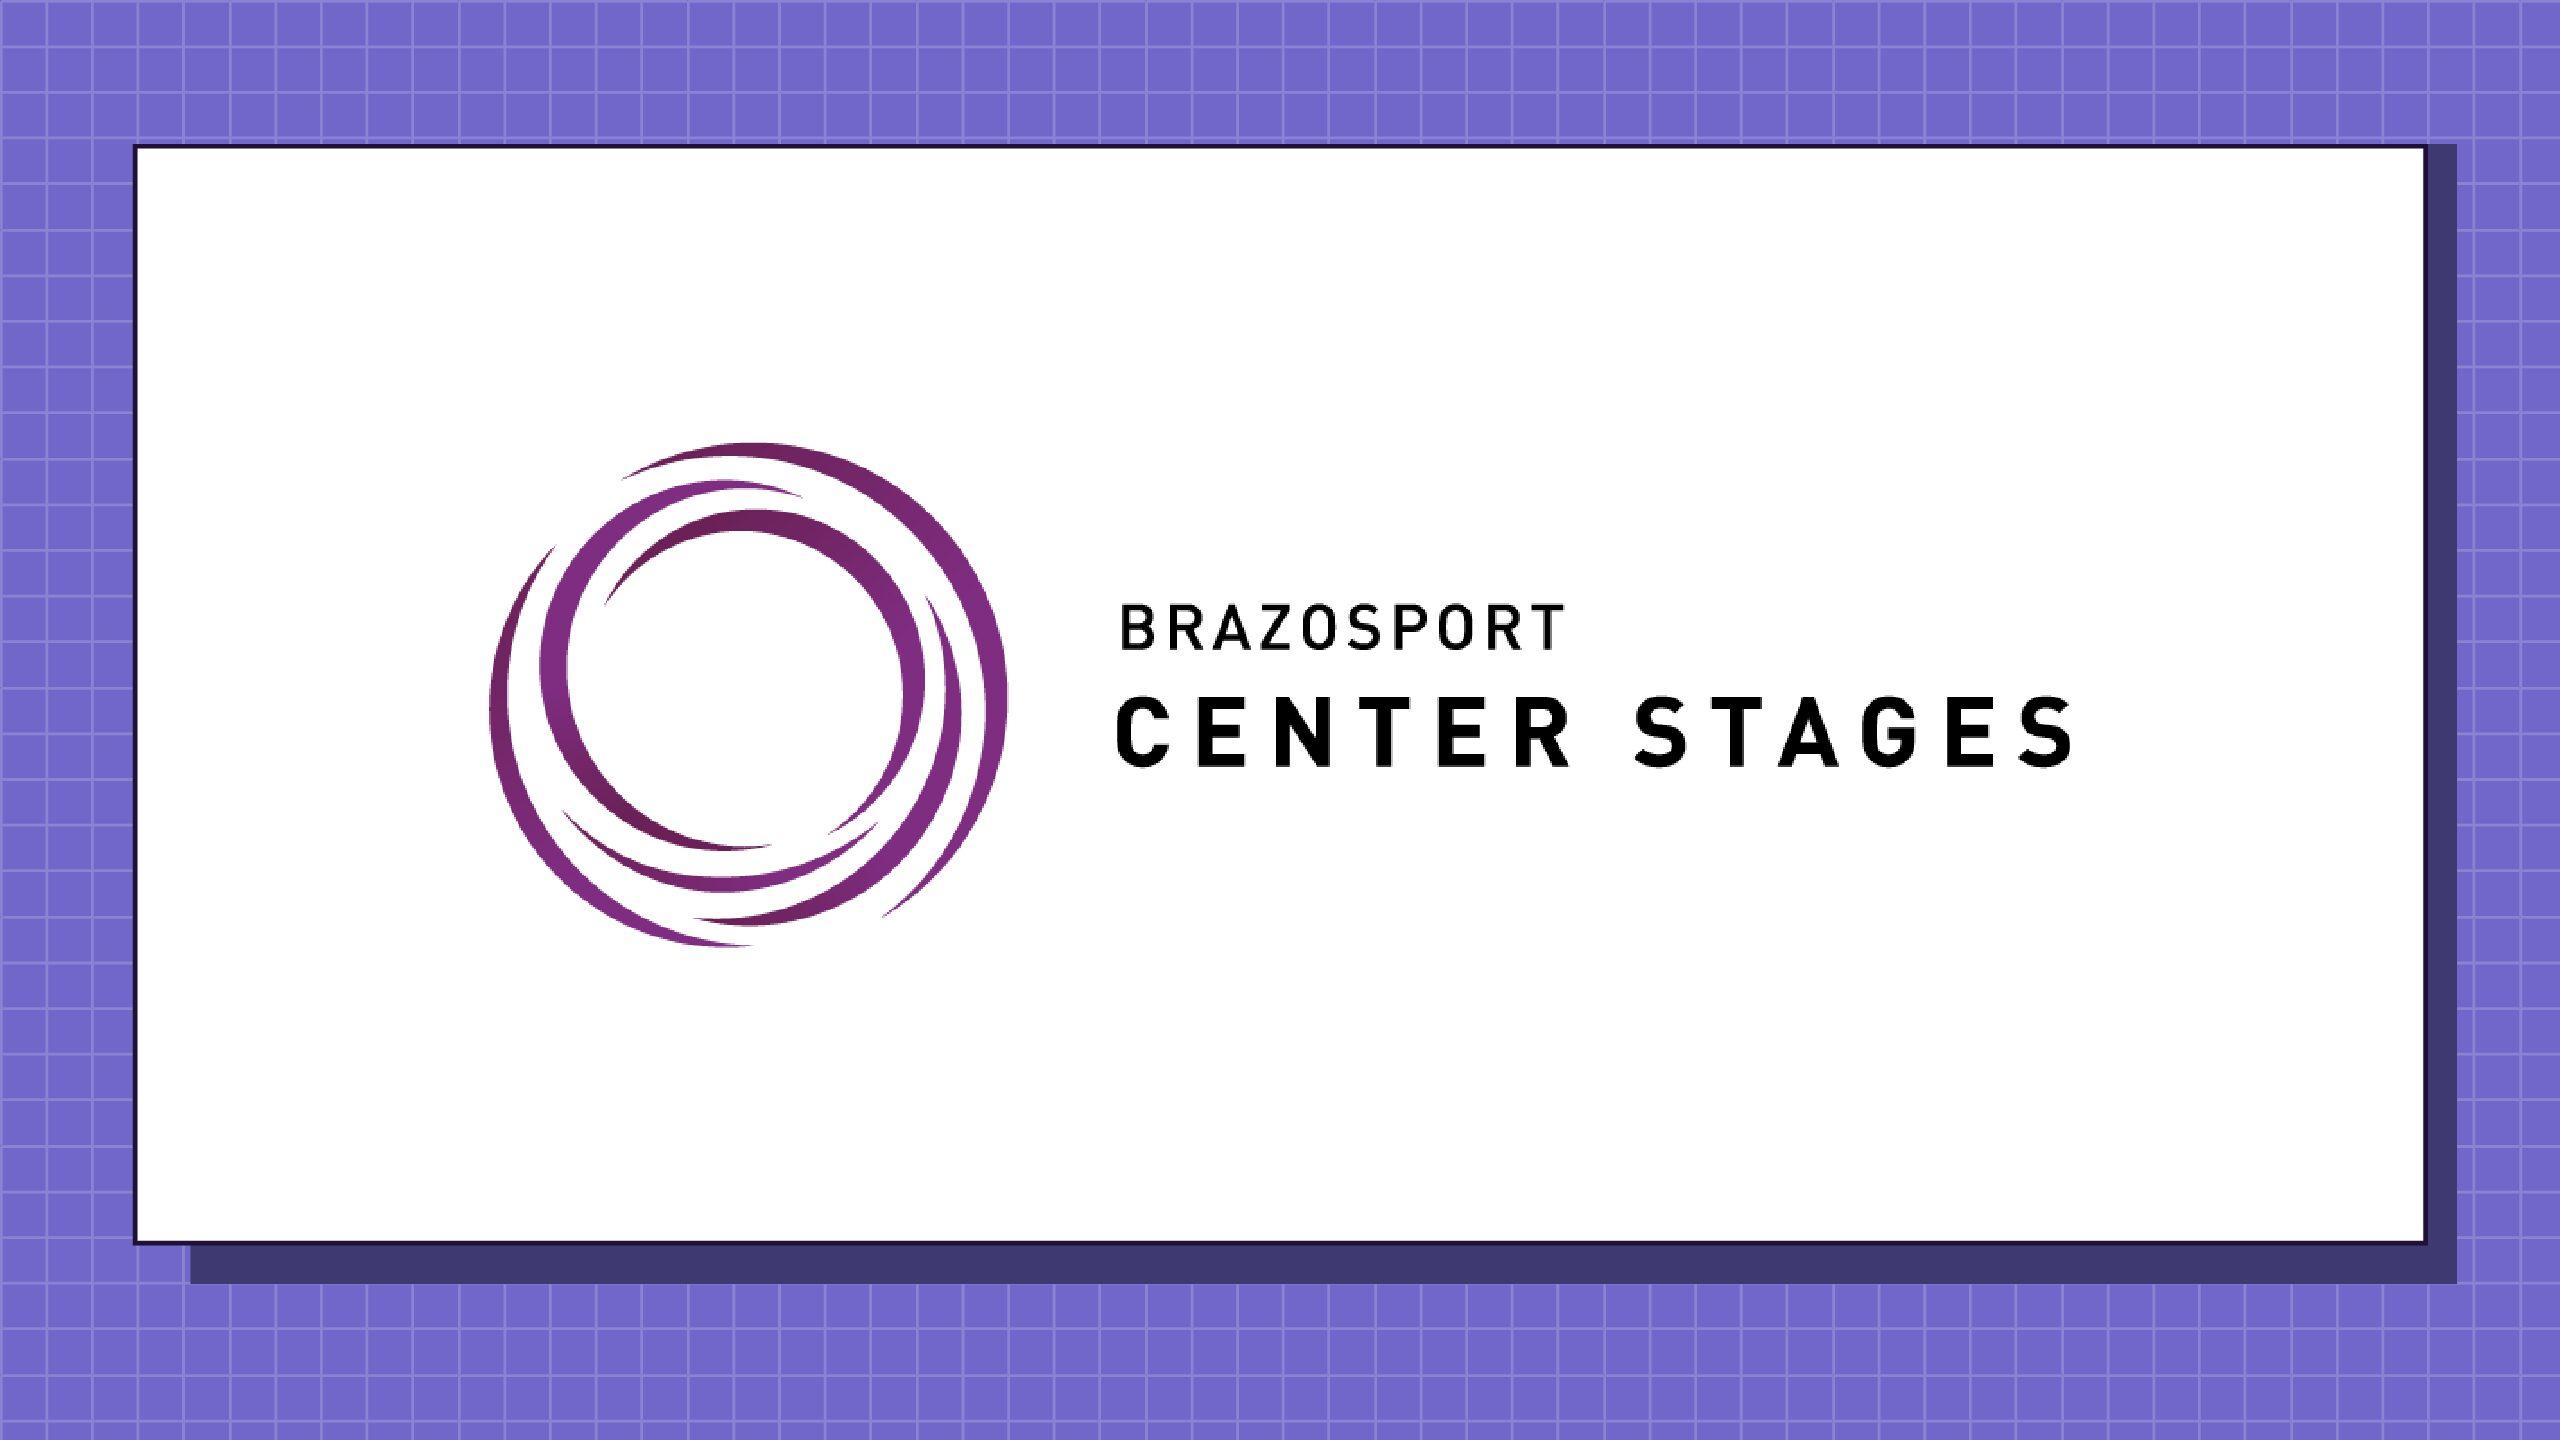 Brazosport Center Stages Announces 2021/2022 Season